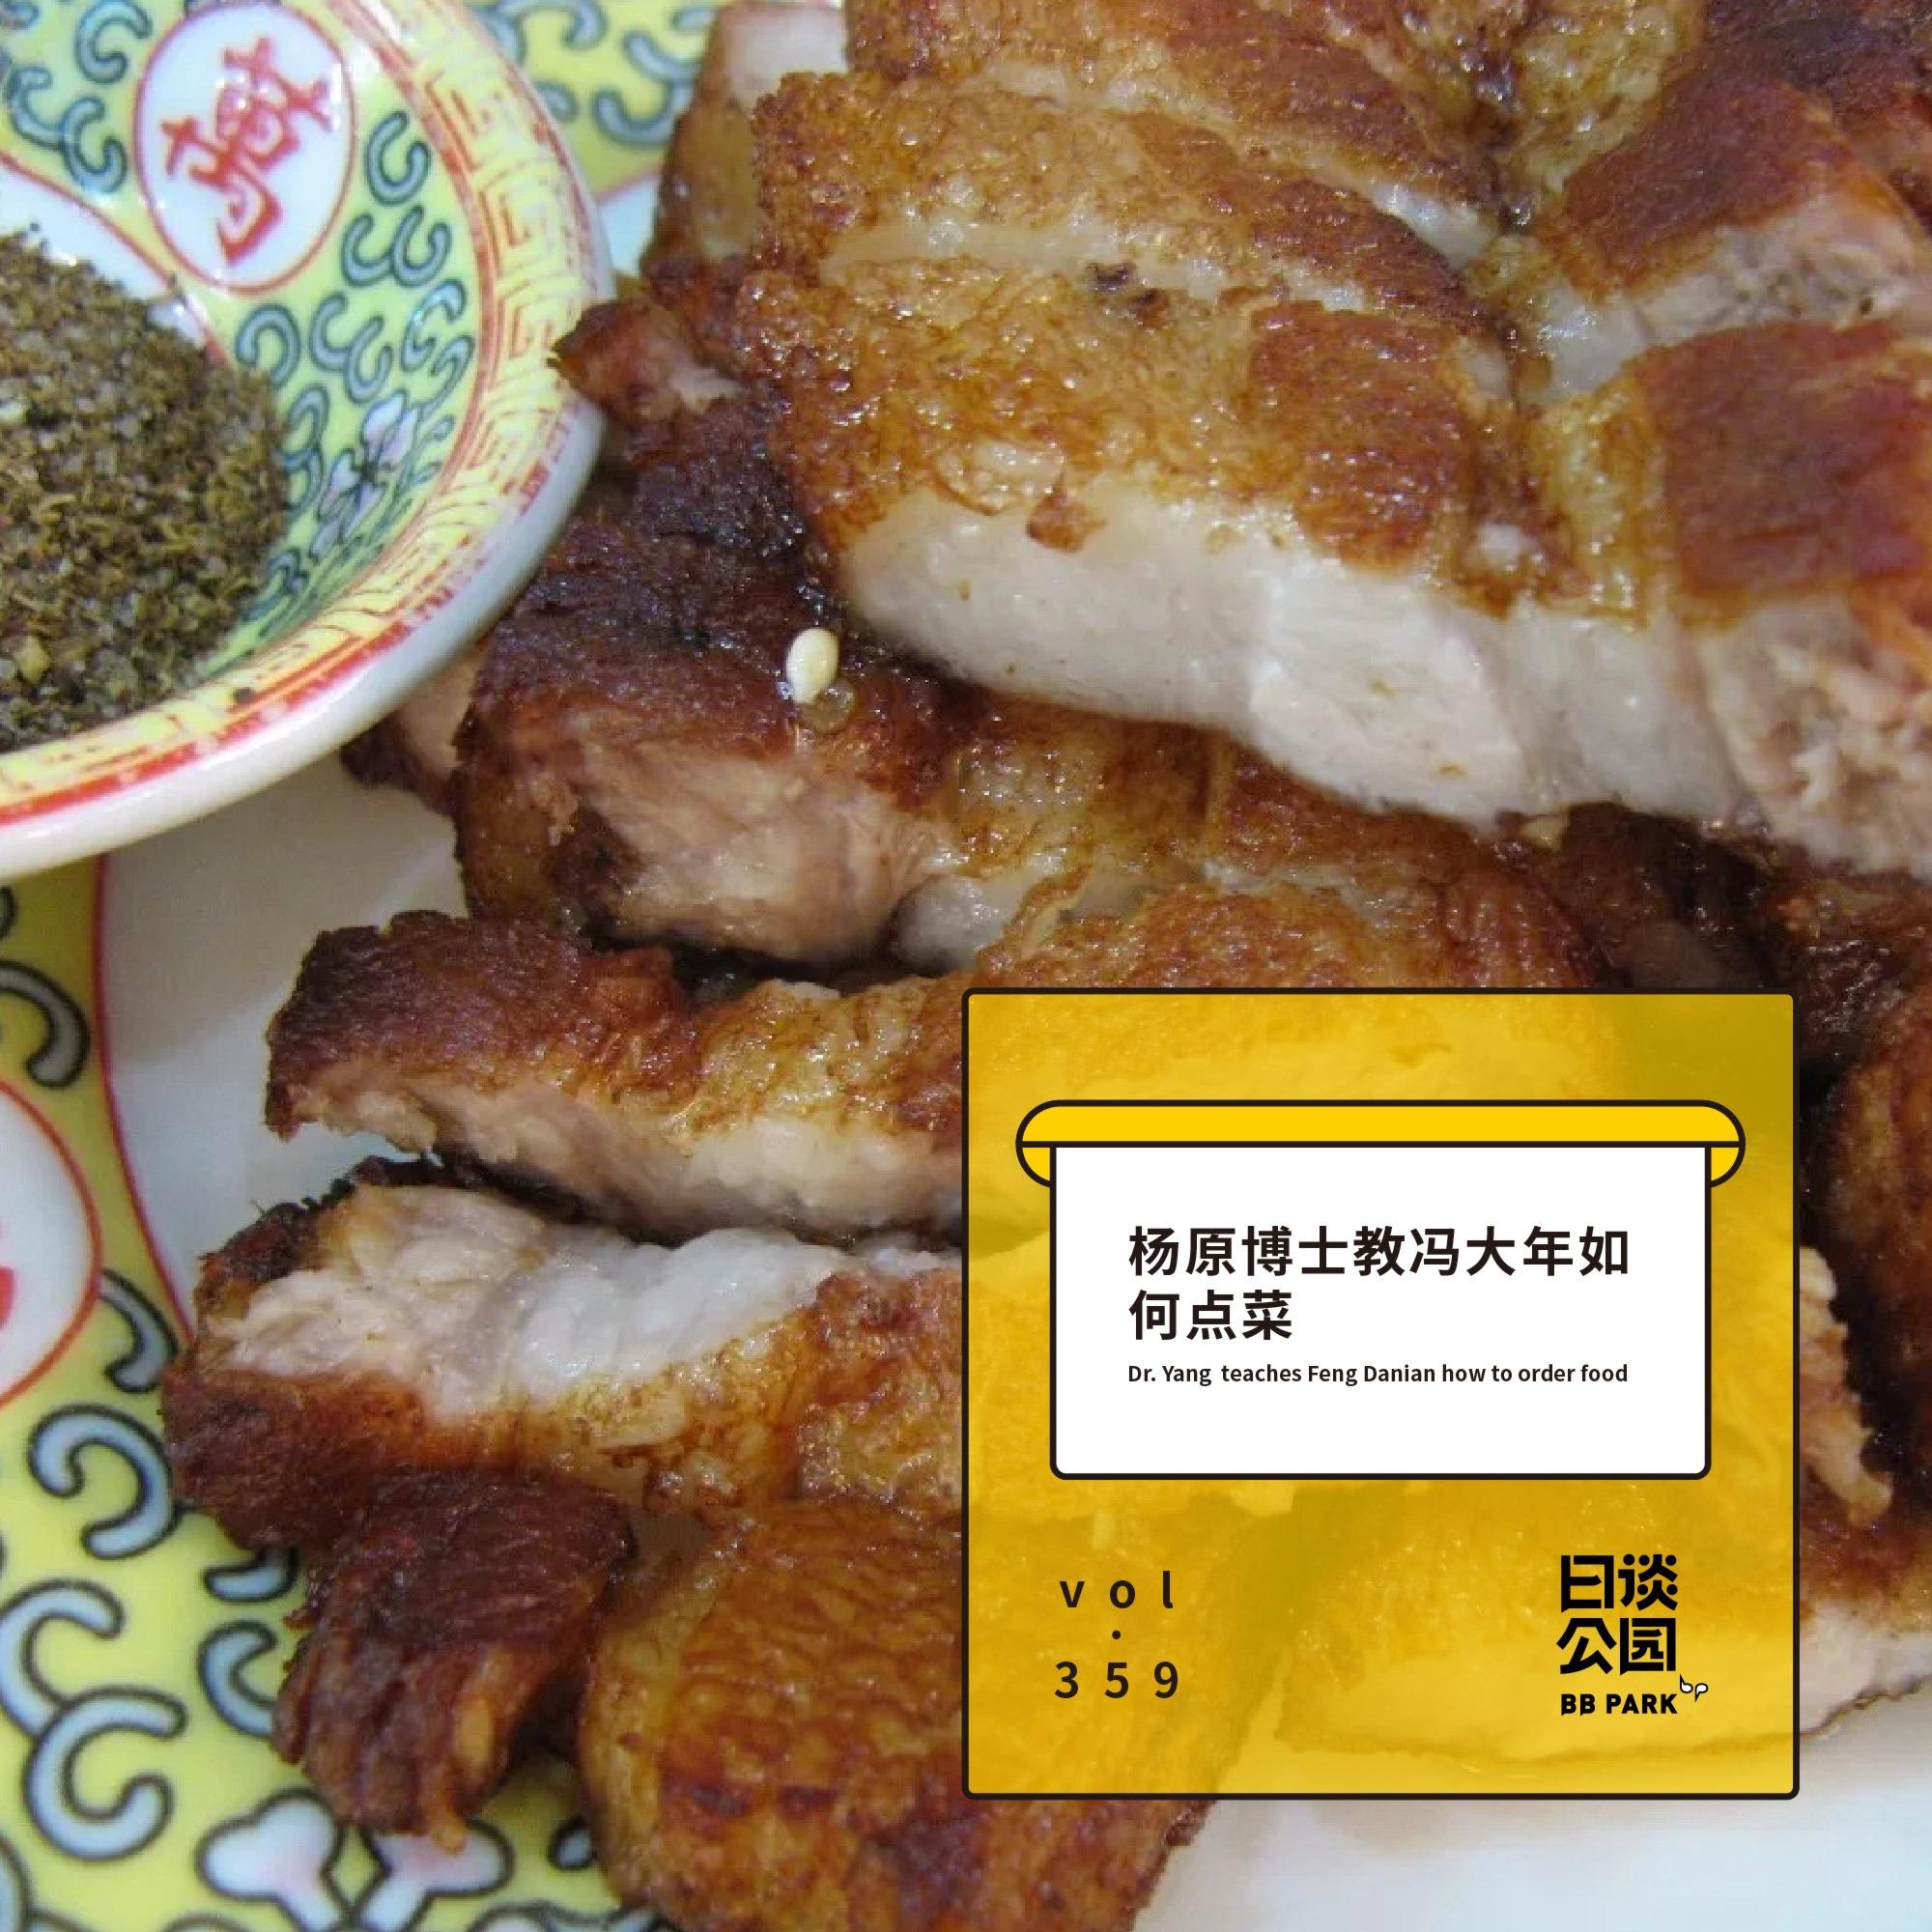 vol.359 杨原博士教冯大年如何点菜